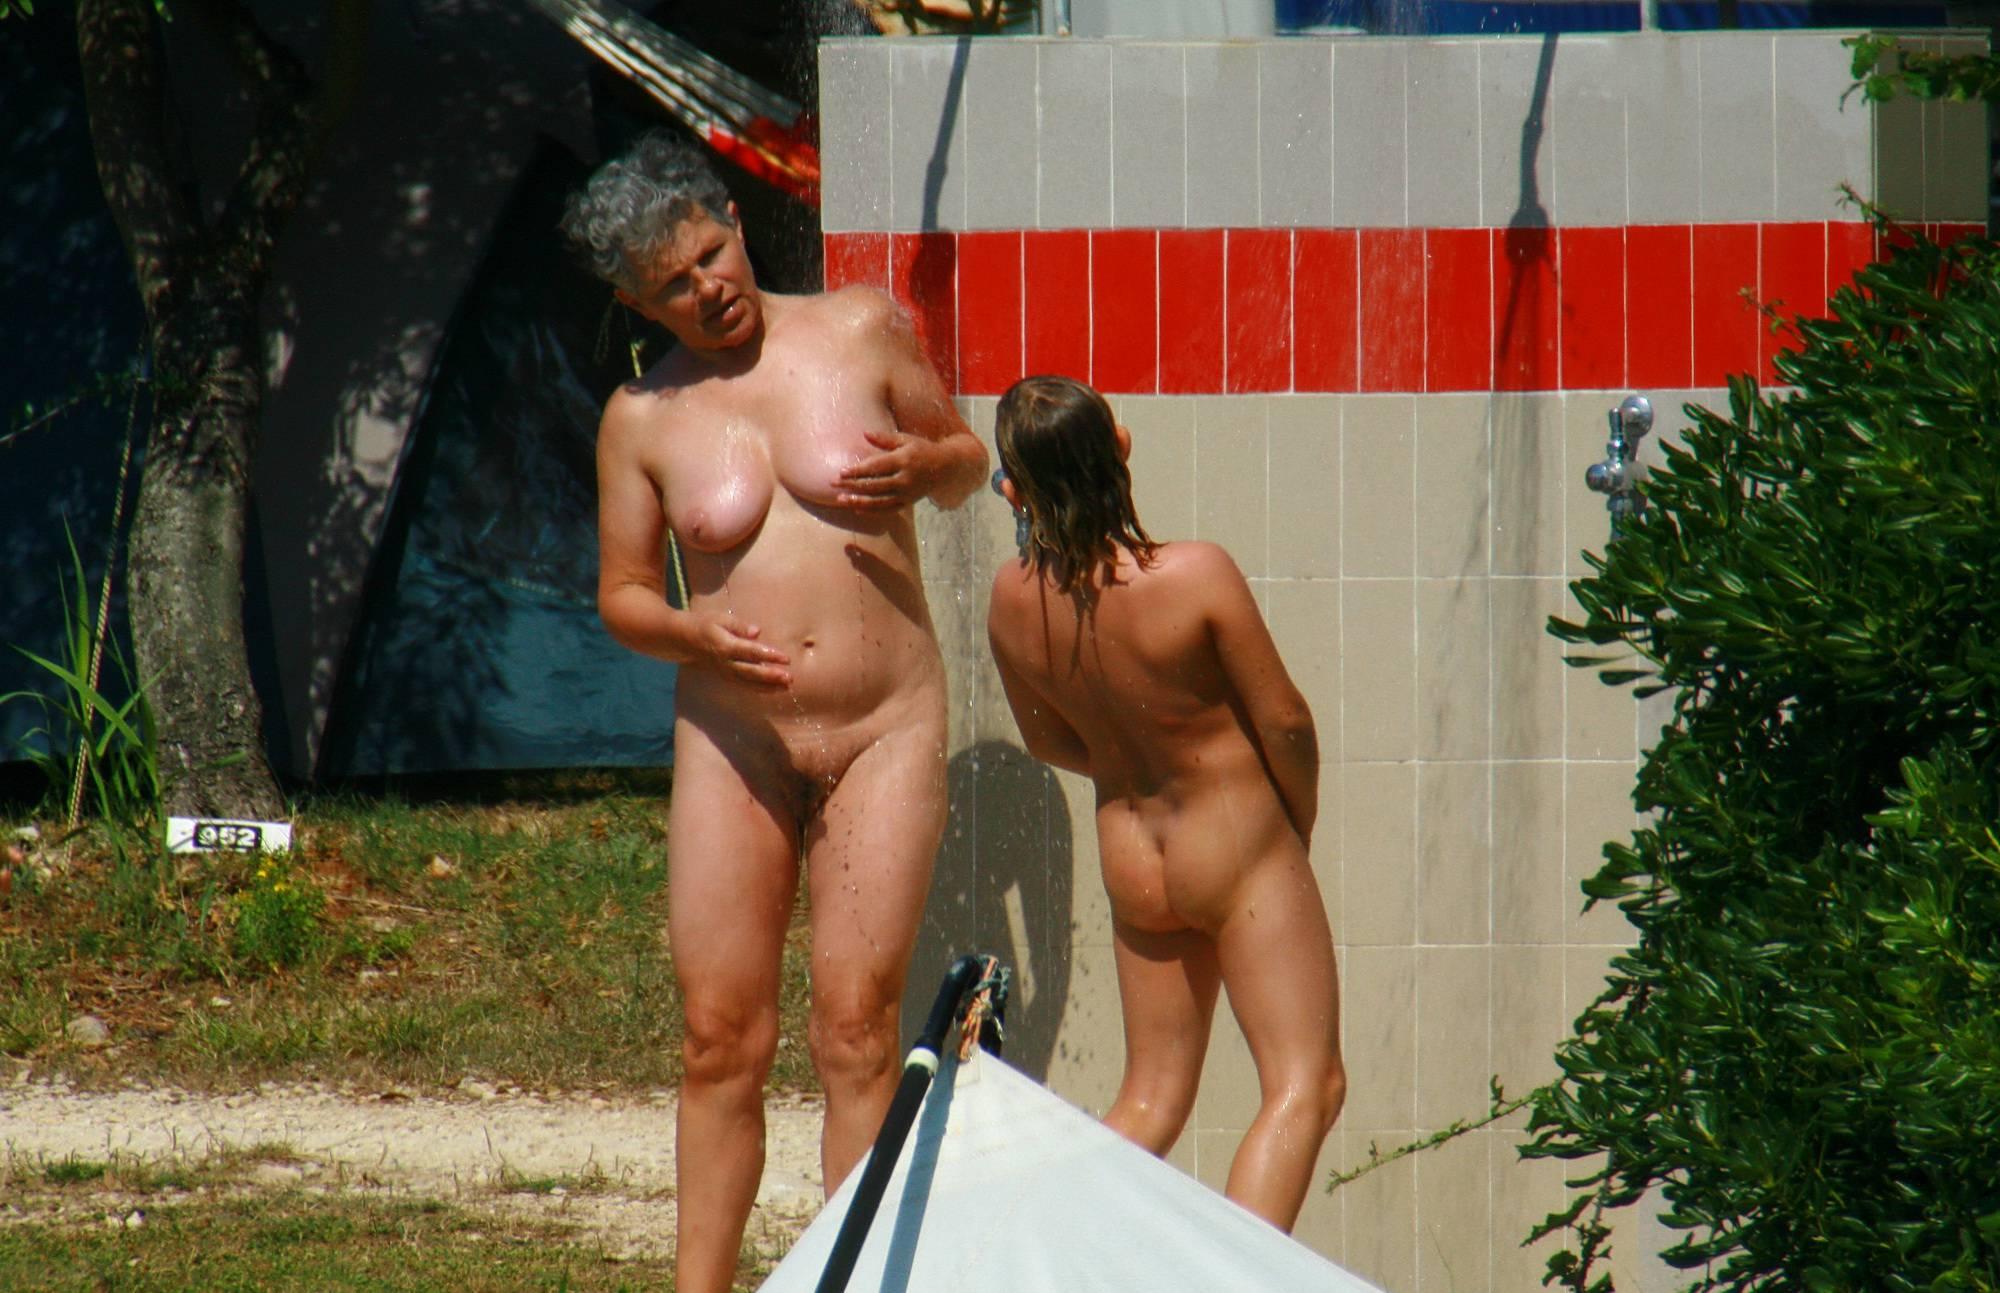 Hot Summer Water Down - 2